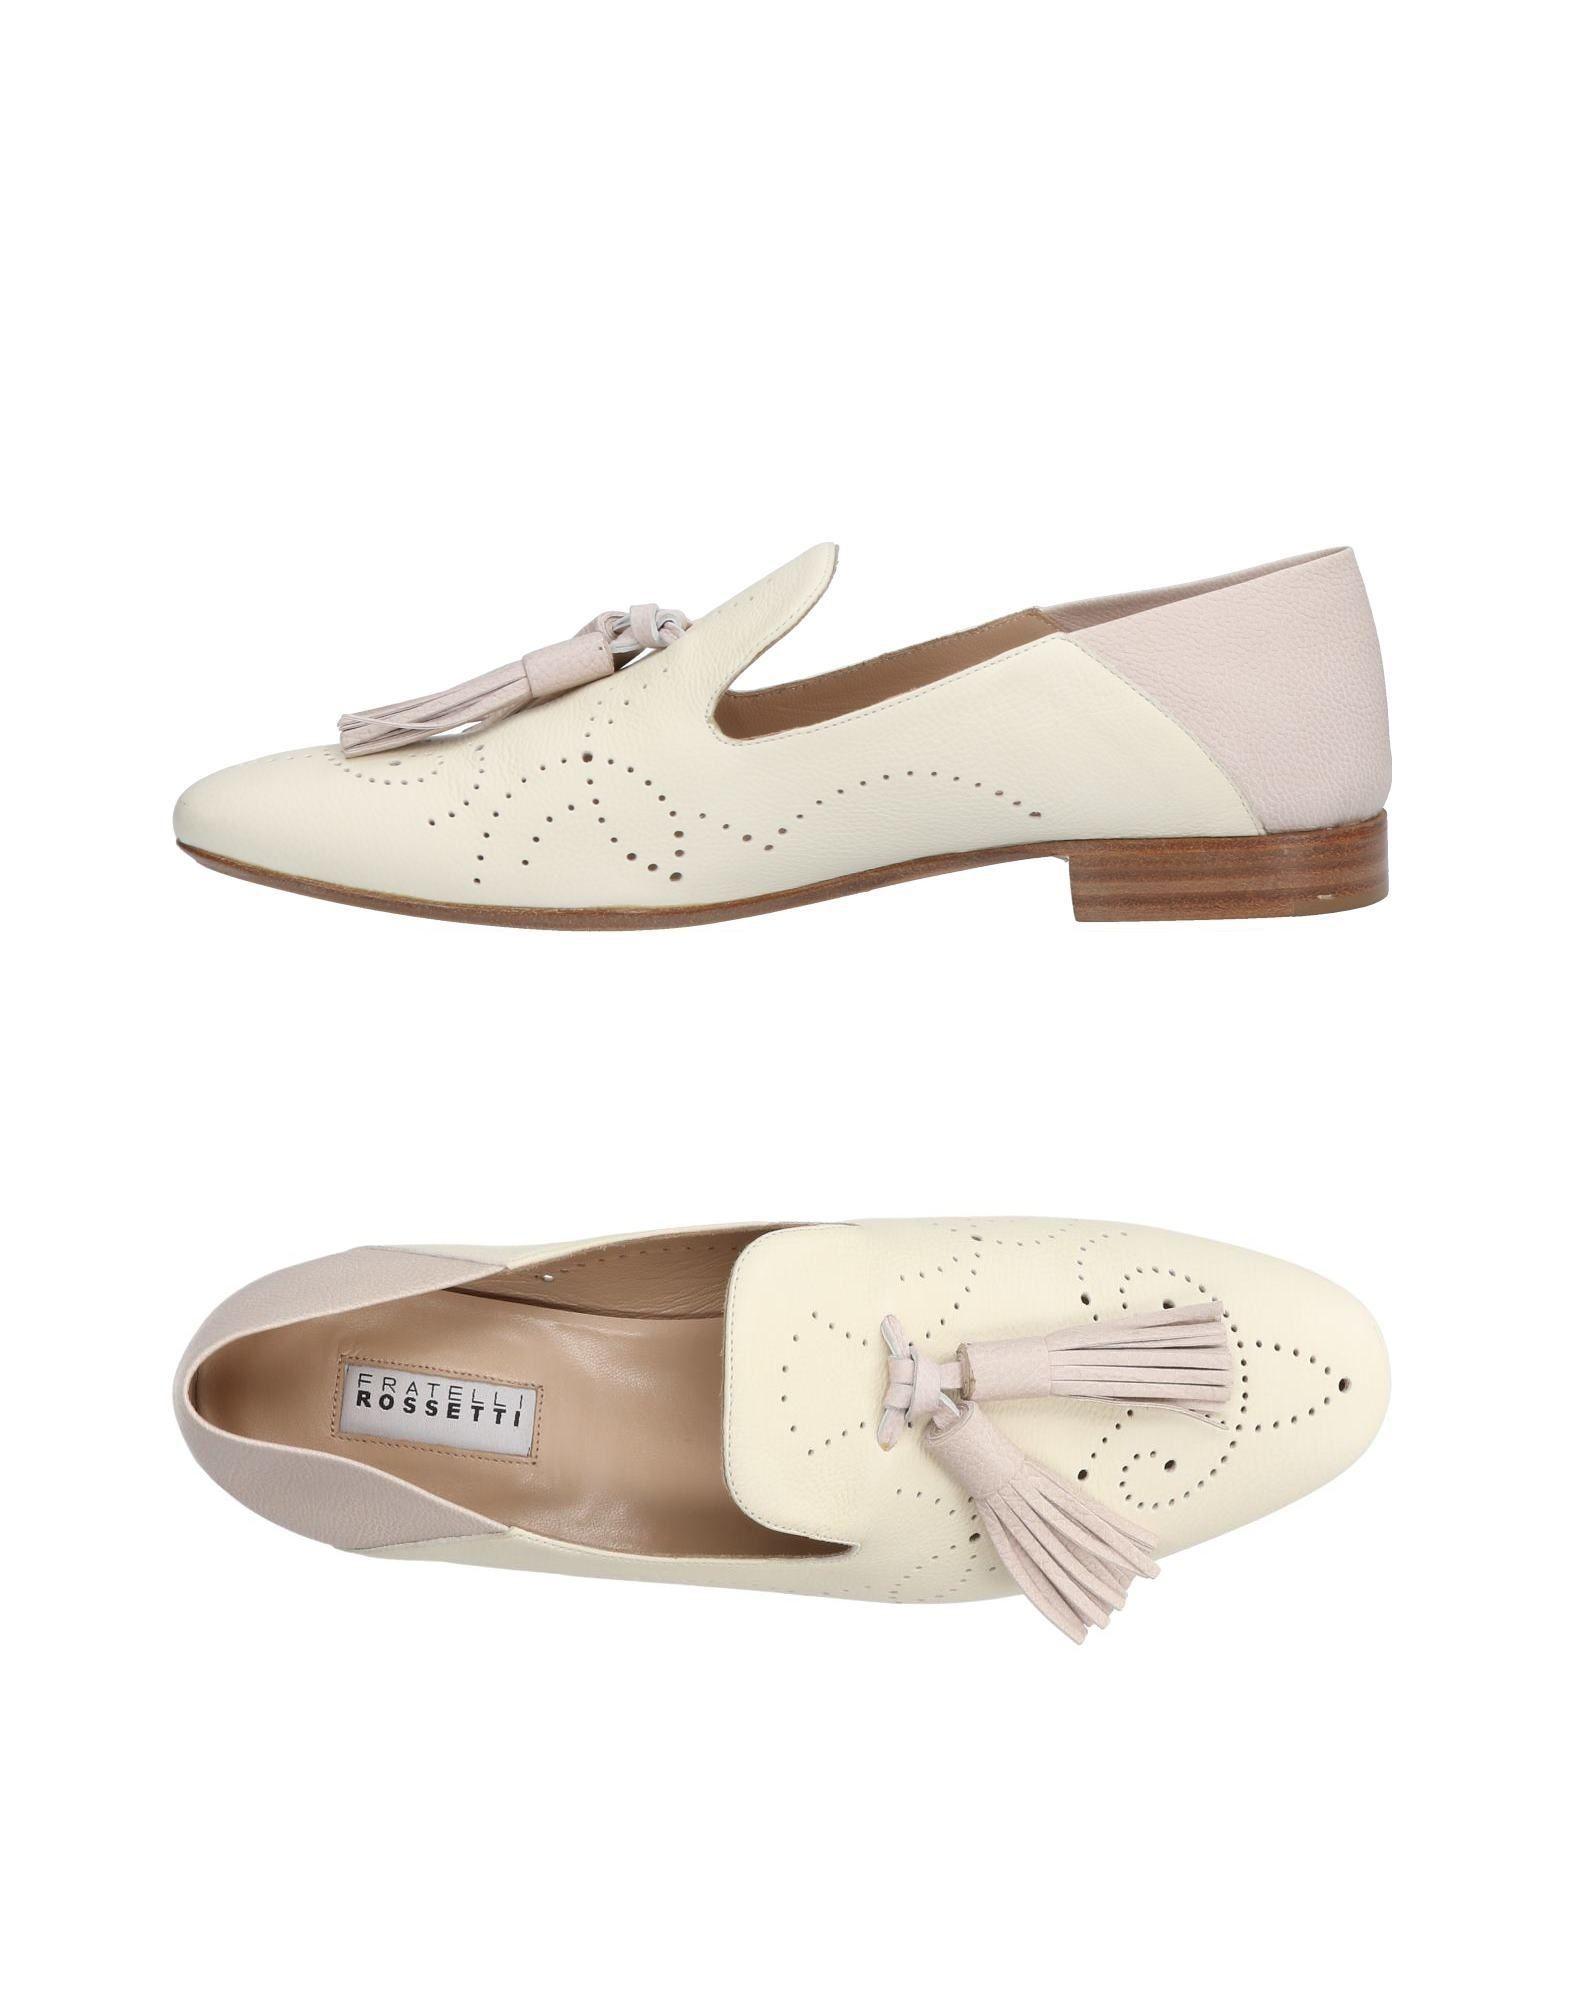 Fratelli Rossetti Mokassins Damen  11440638IUGut aussehende strapazierfähige Schuhe